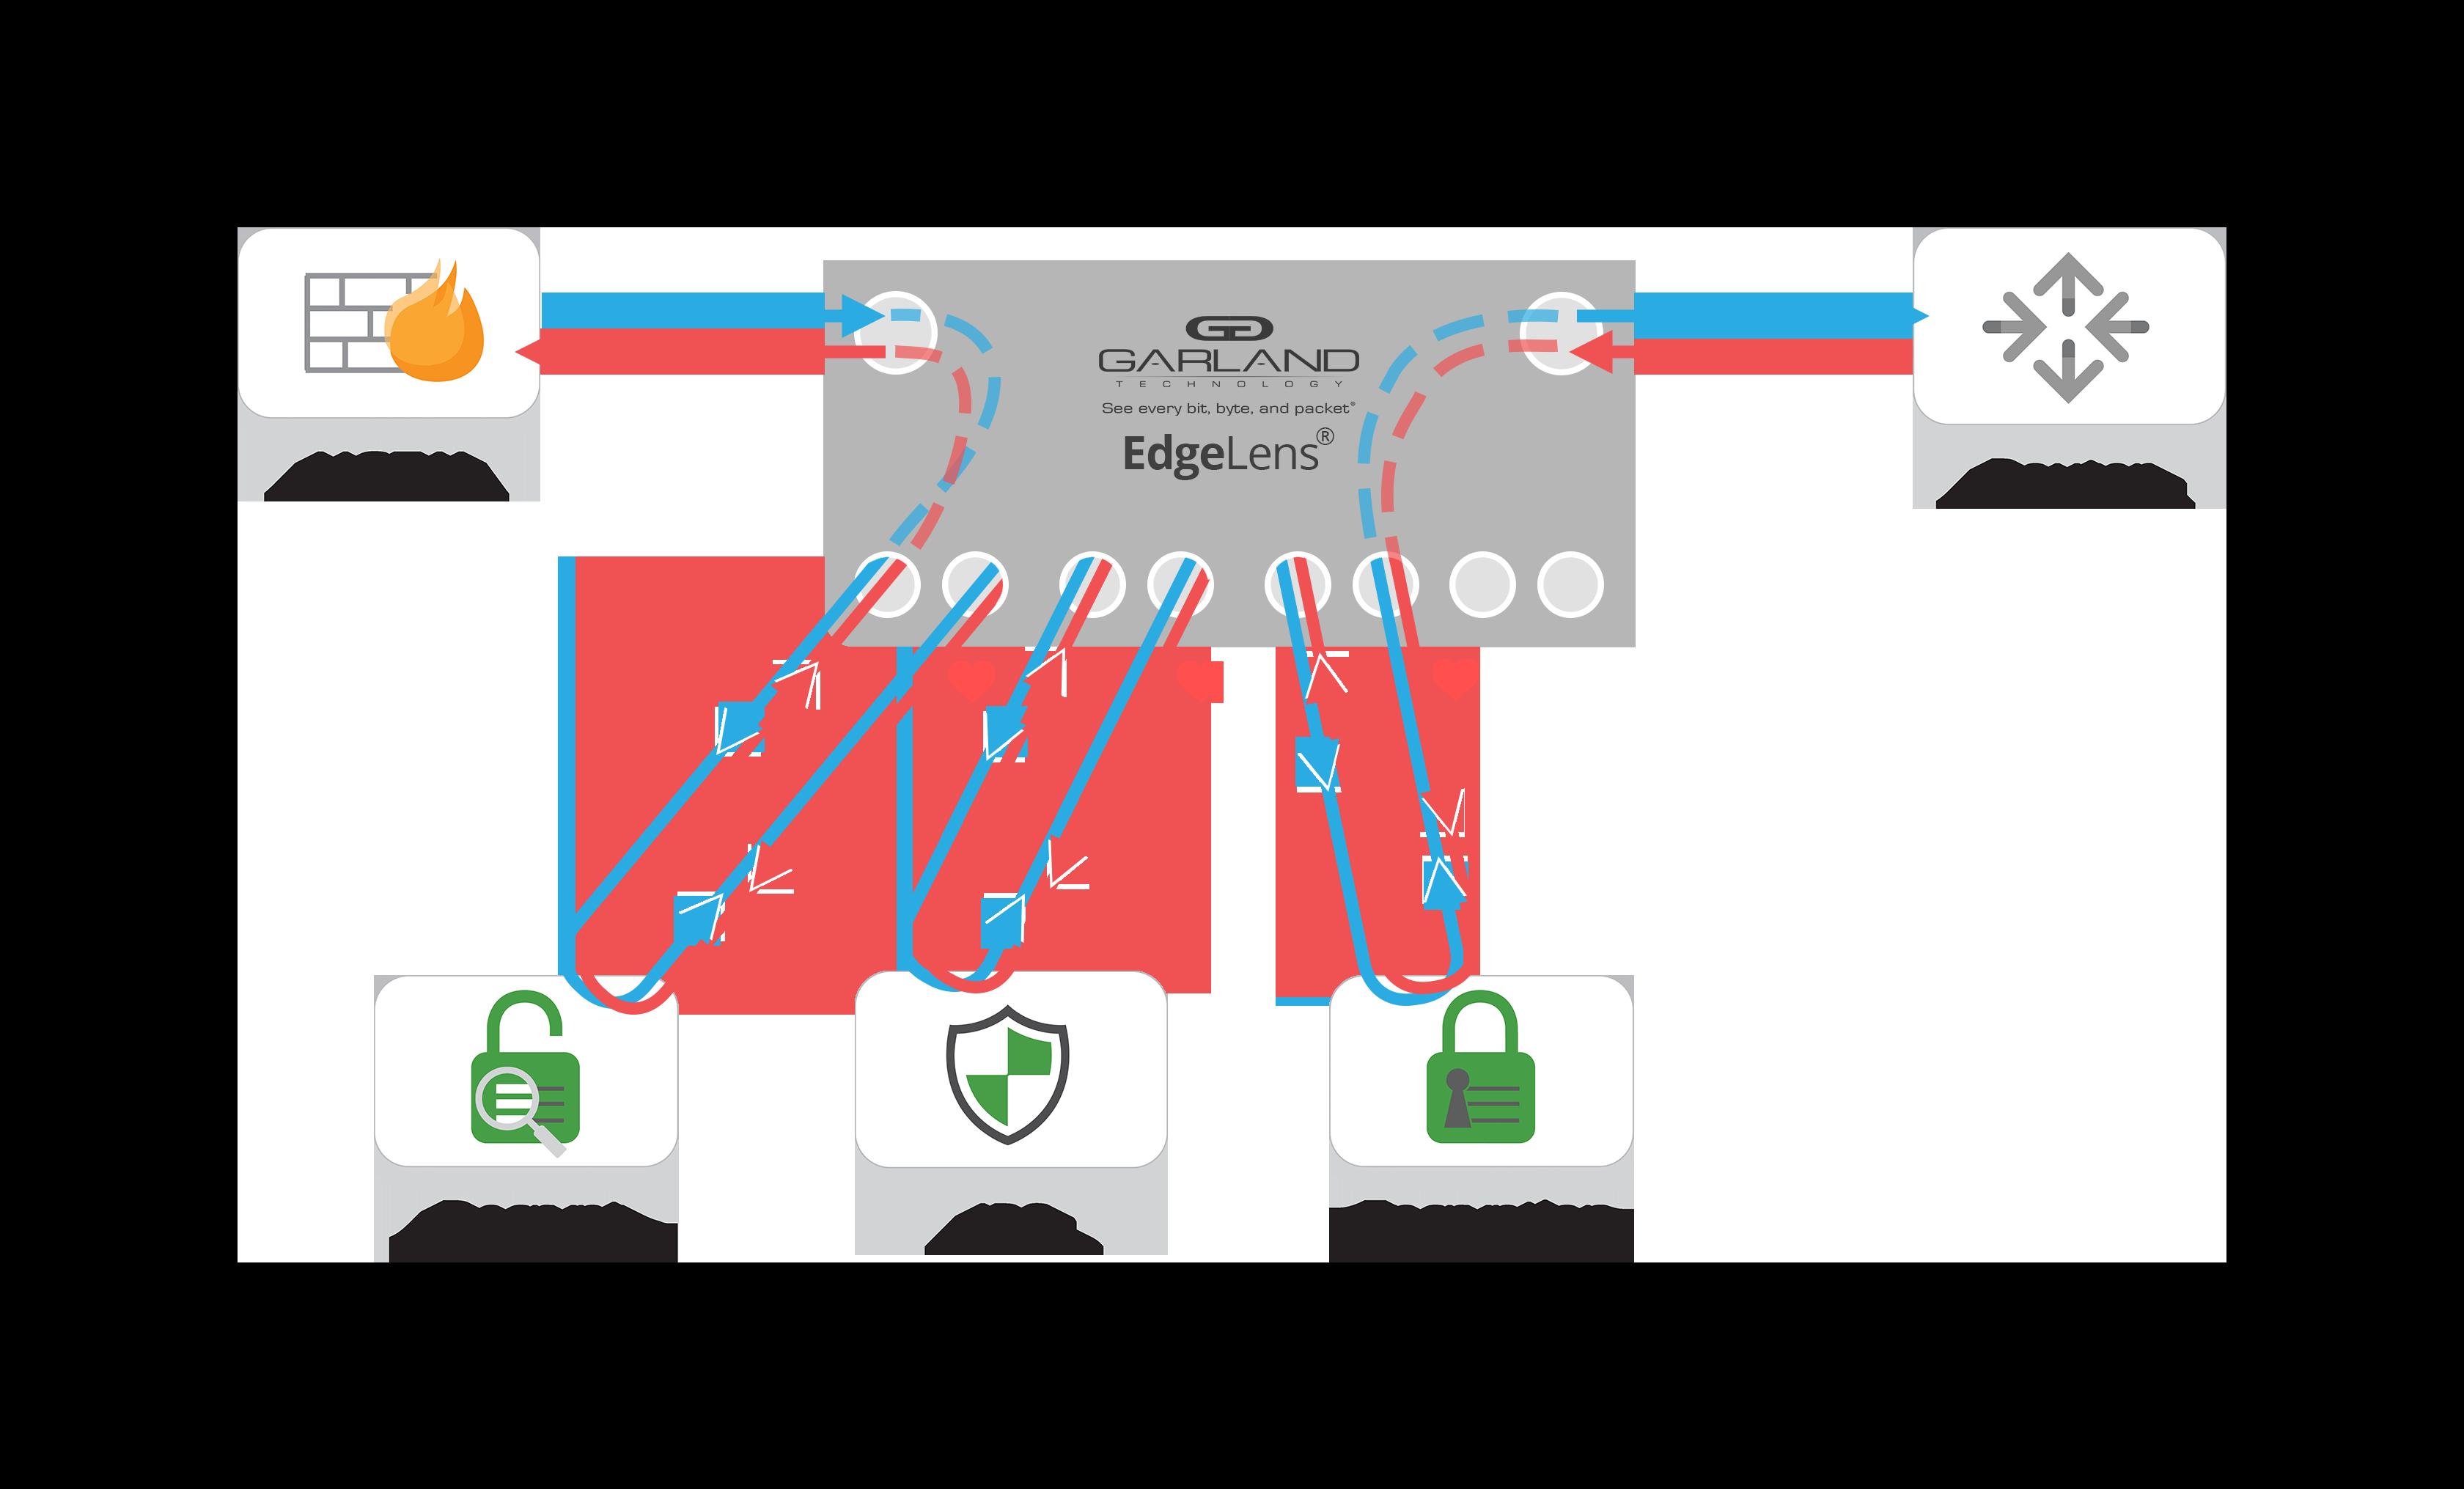 EdgeLens Decrypt Encrpyt network Flow